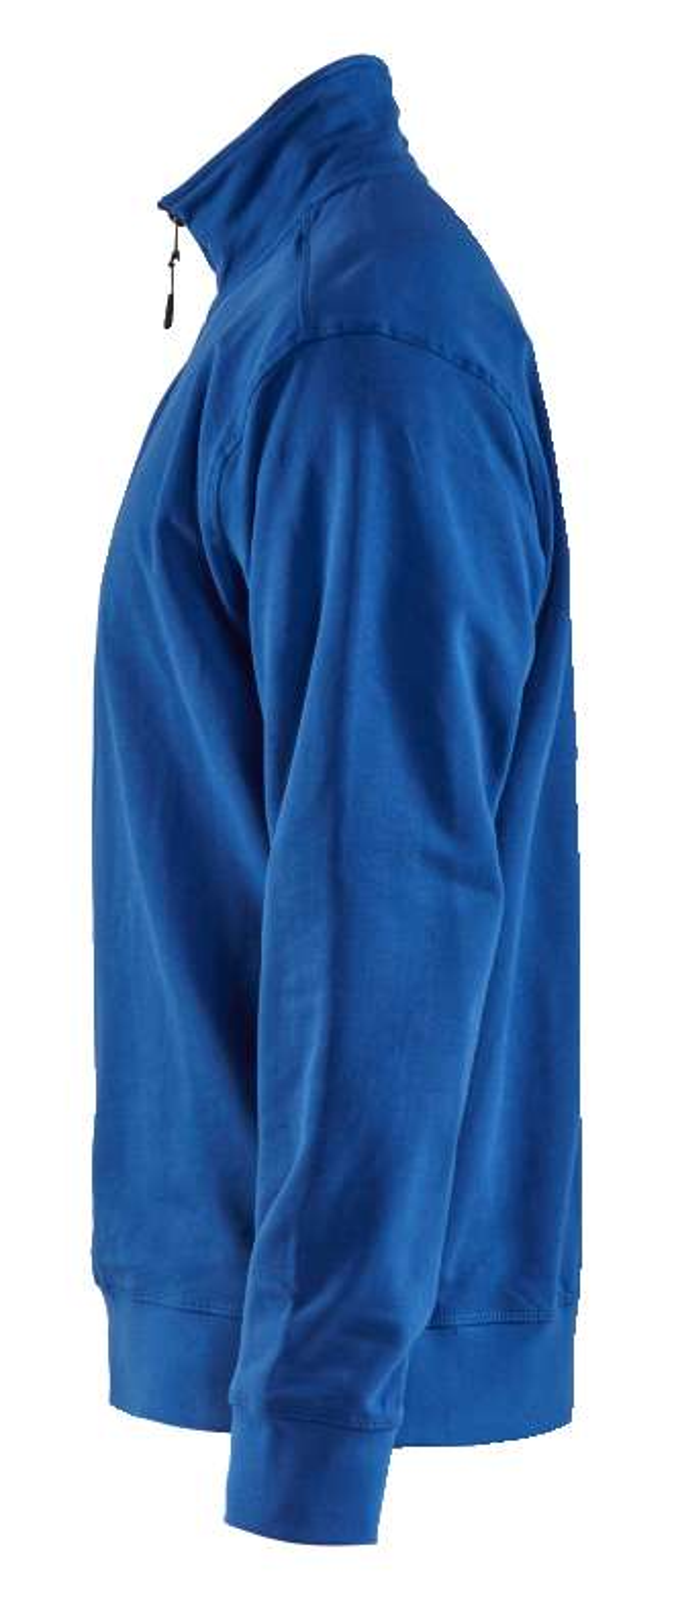 Blaklader Sweatshirts 33691158 korenblauw(8500)